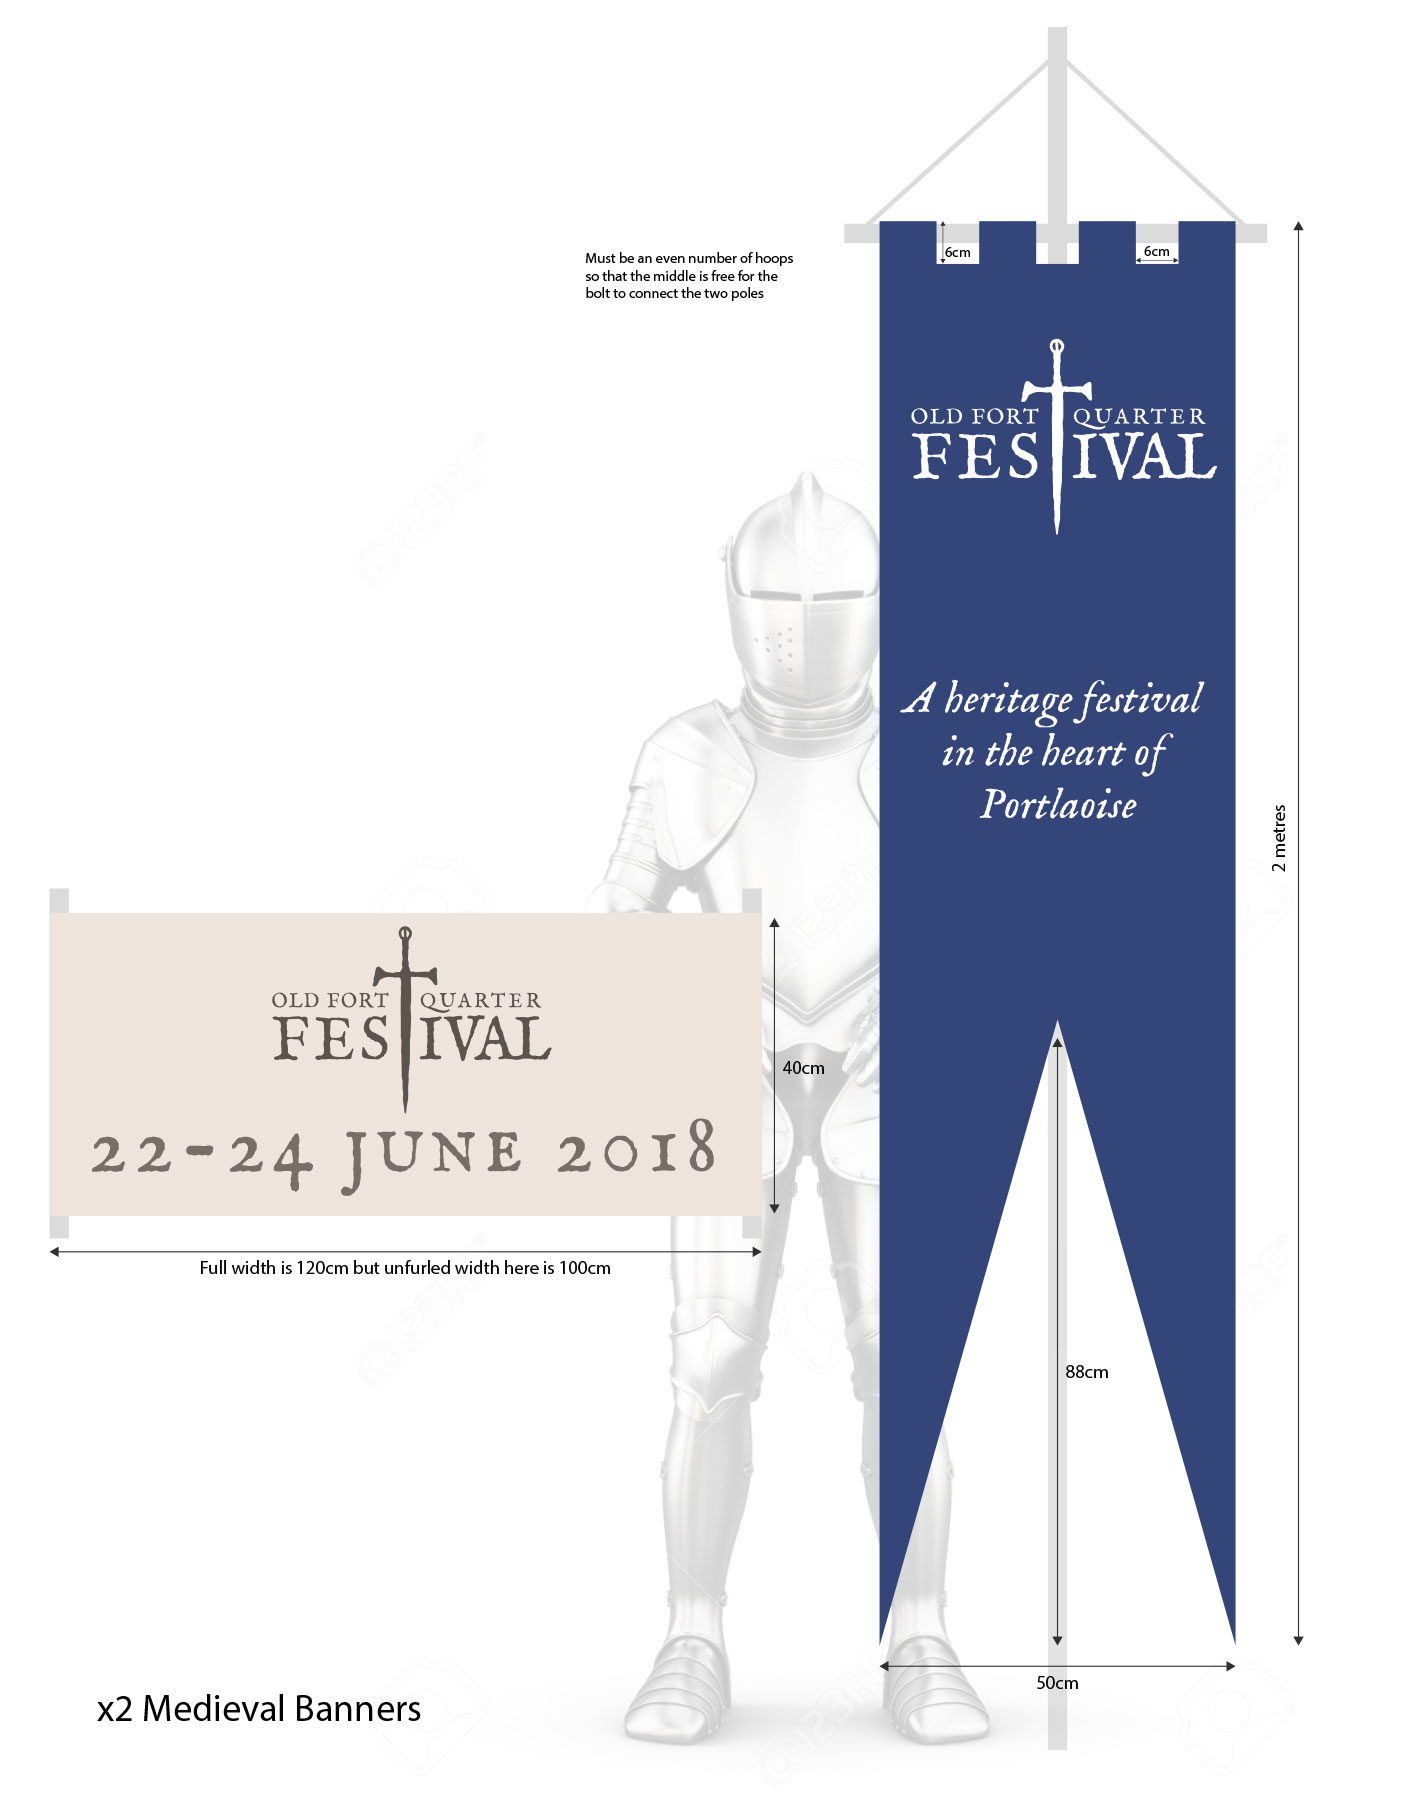 Old Fort Quarter Festival banners